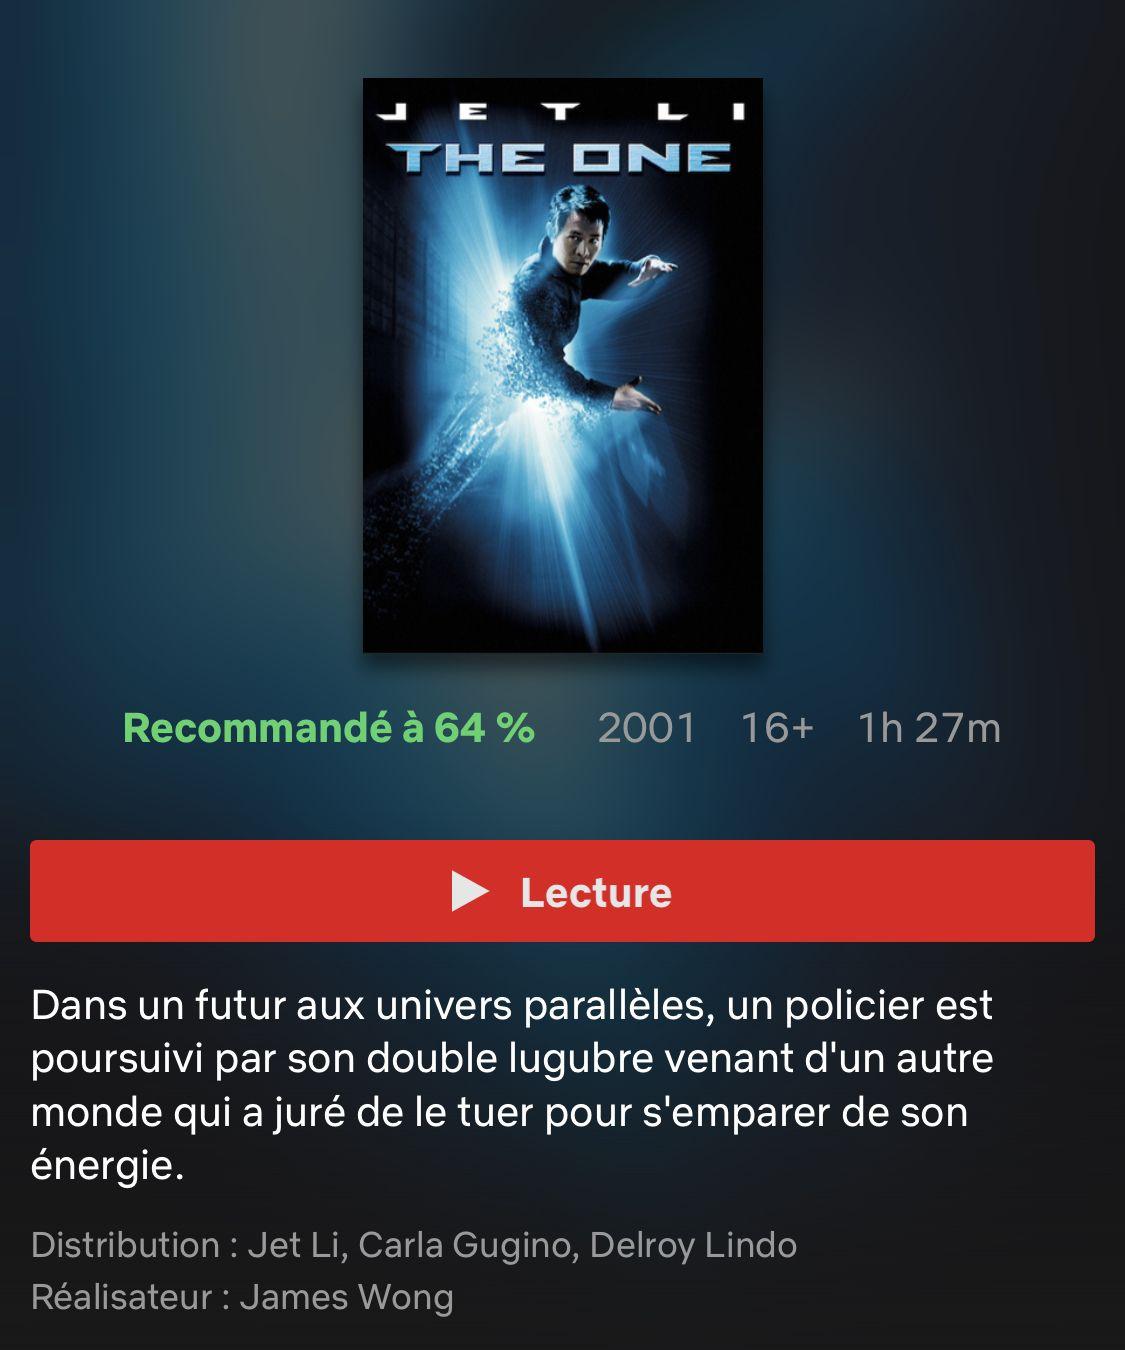 Theone Jet Li Carla Gugino Univers Parallele